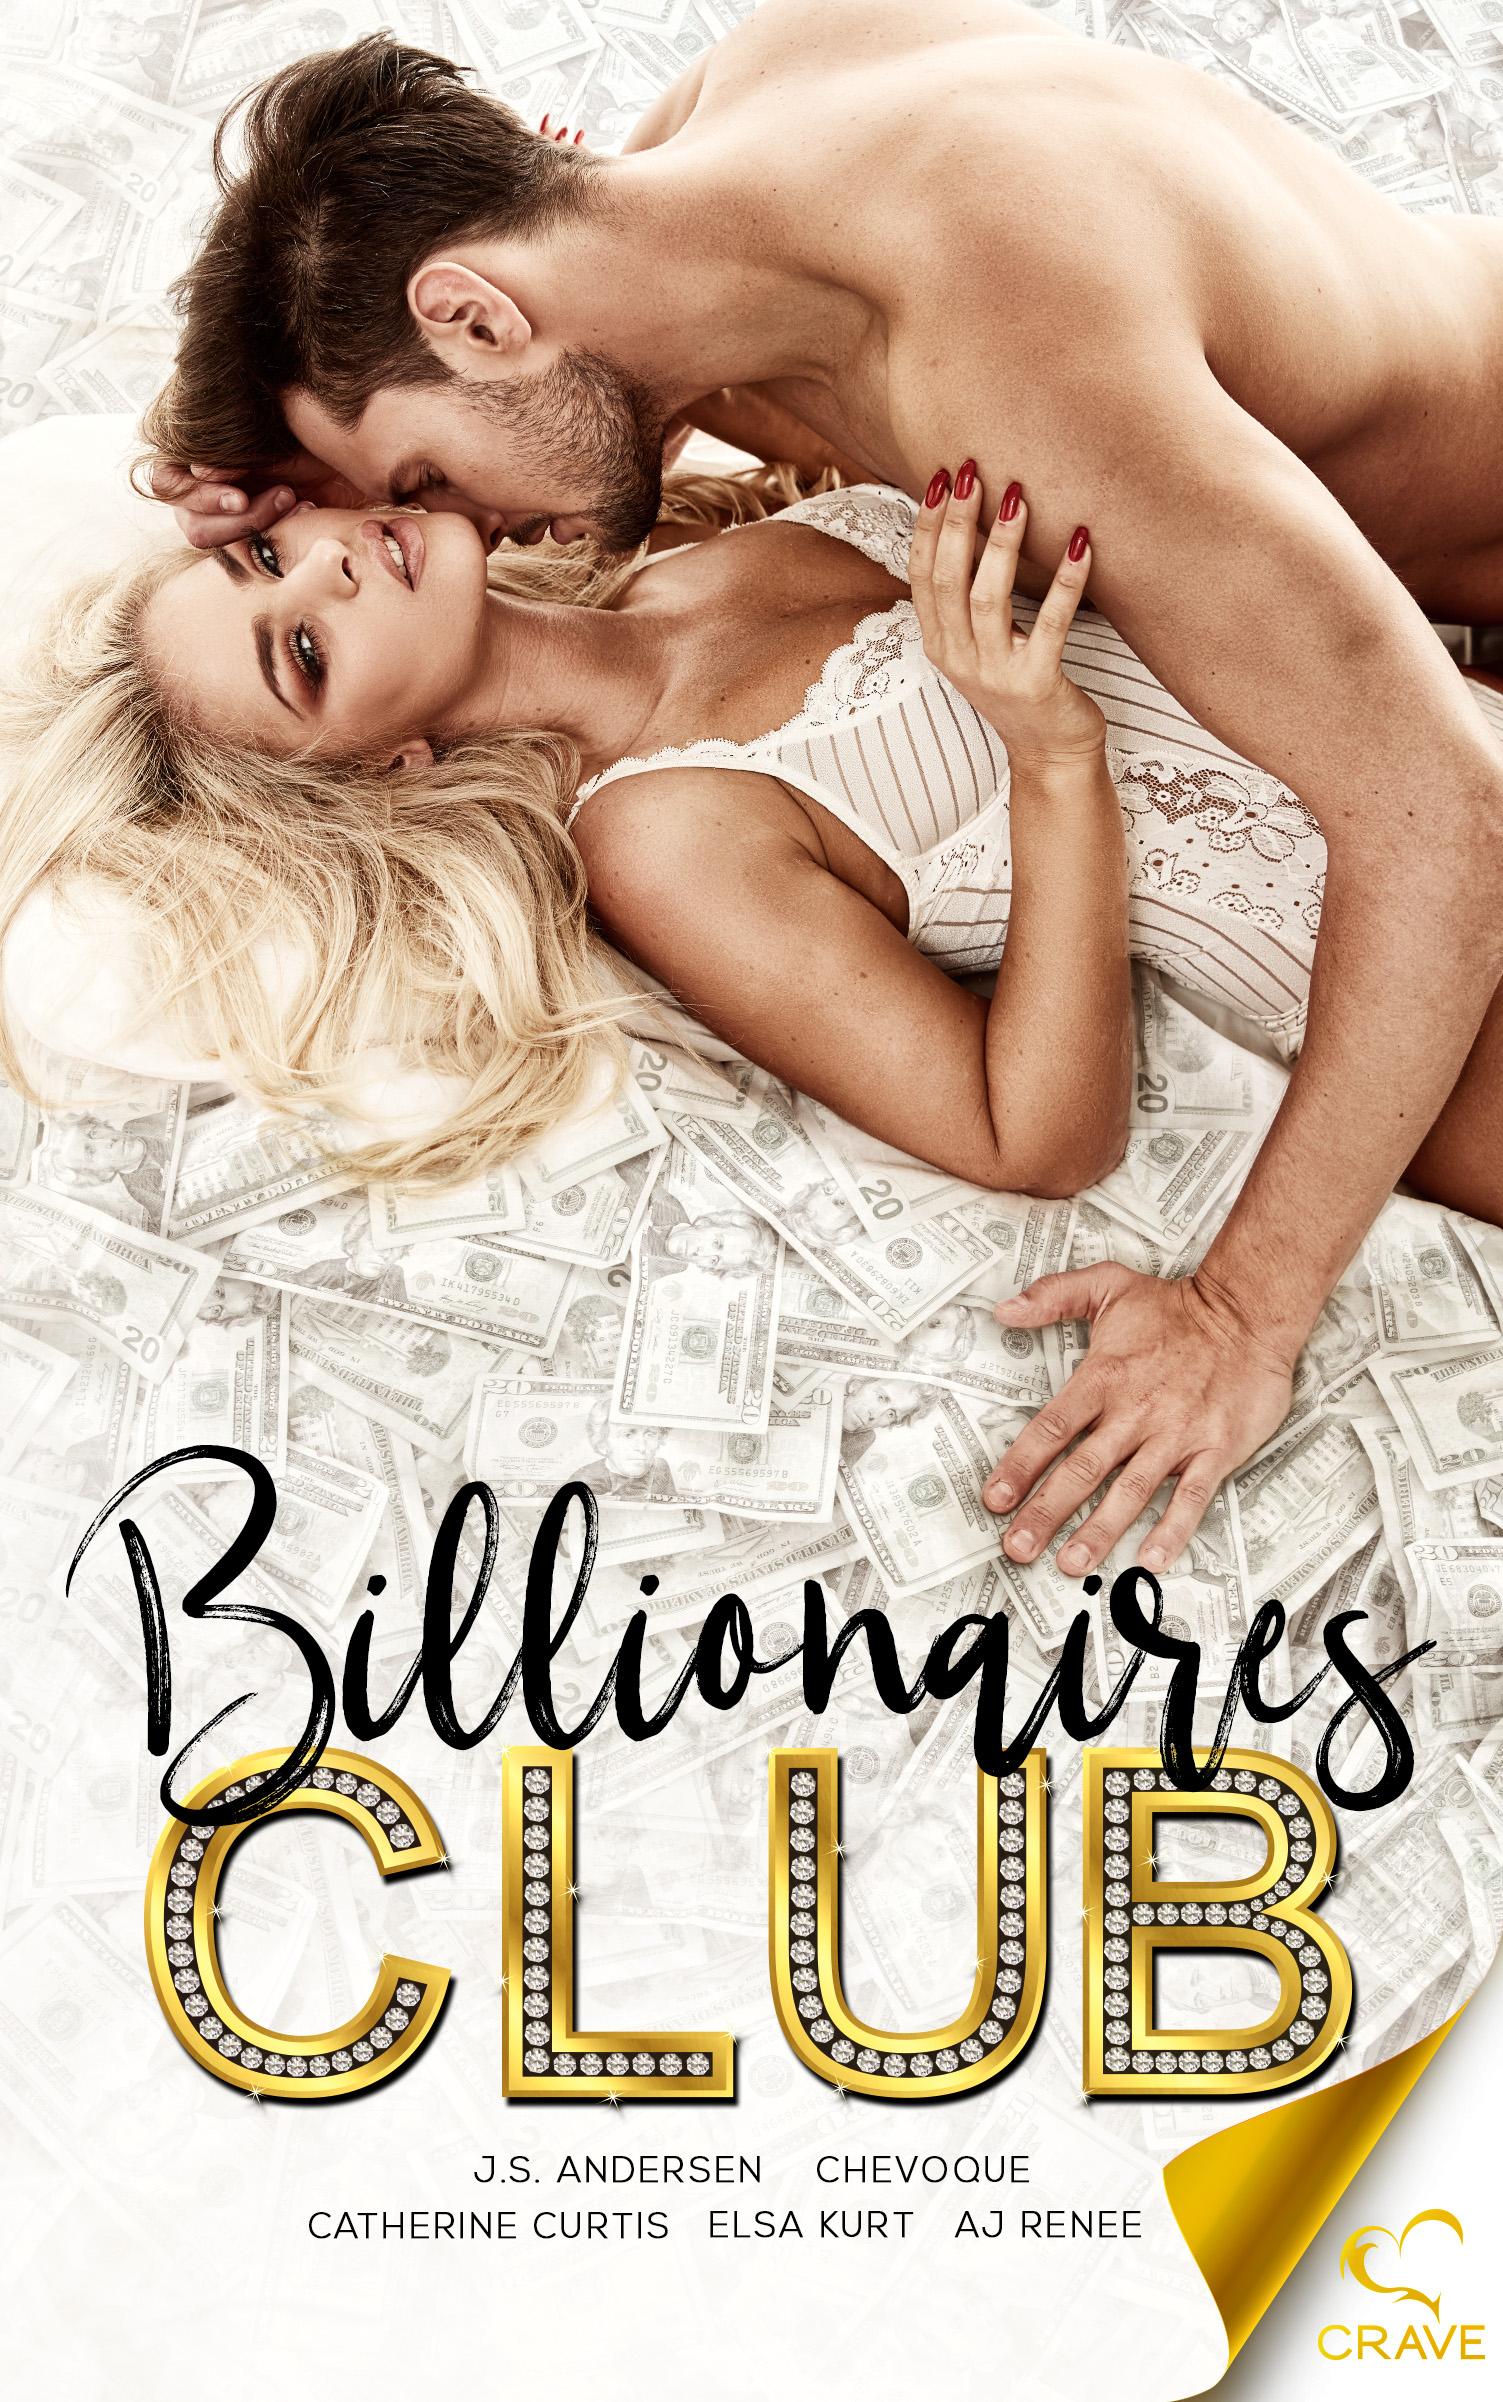 Billionaires Club Crave Publishing AJ Renee